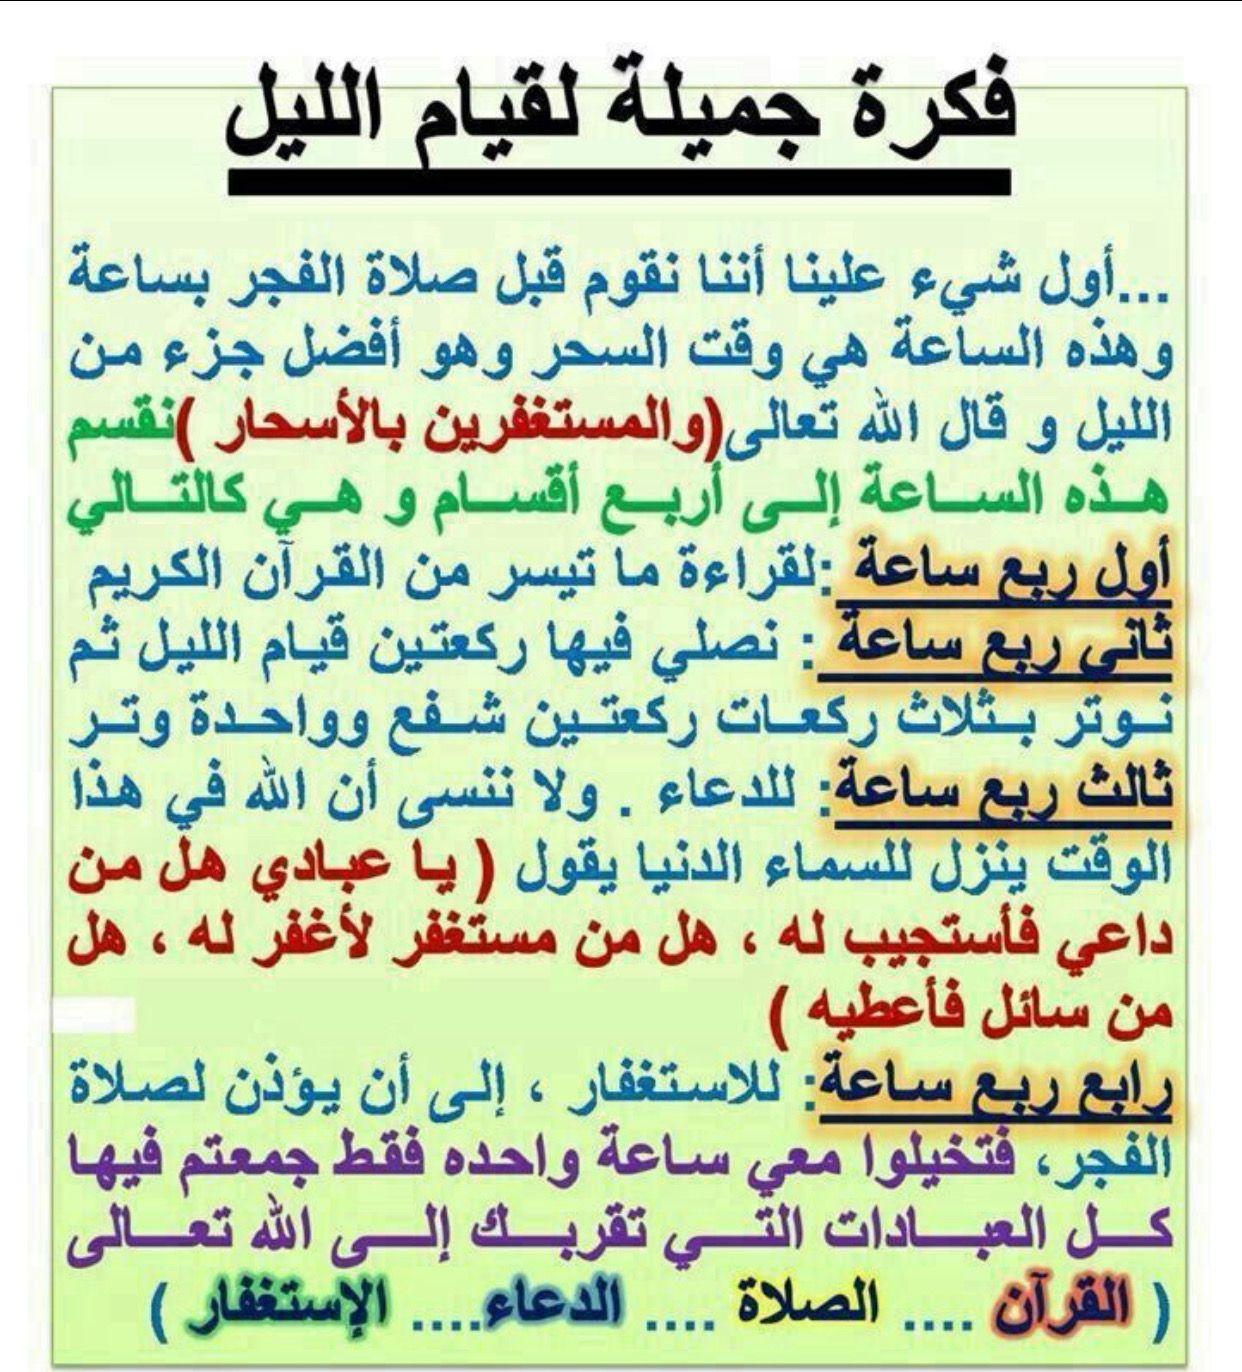 Pin By Shadiah Turkustani On الدعاء المستجاب Islamic Phrases Islam Facts Islam Beliefs